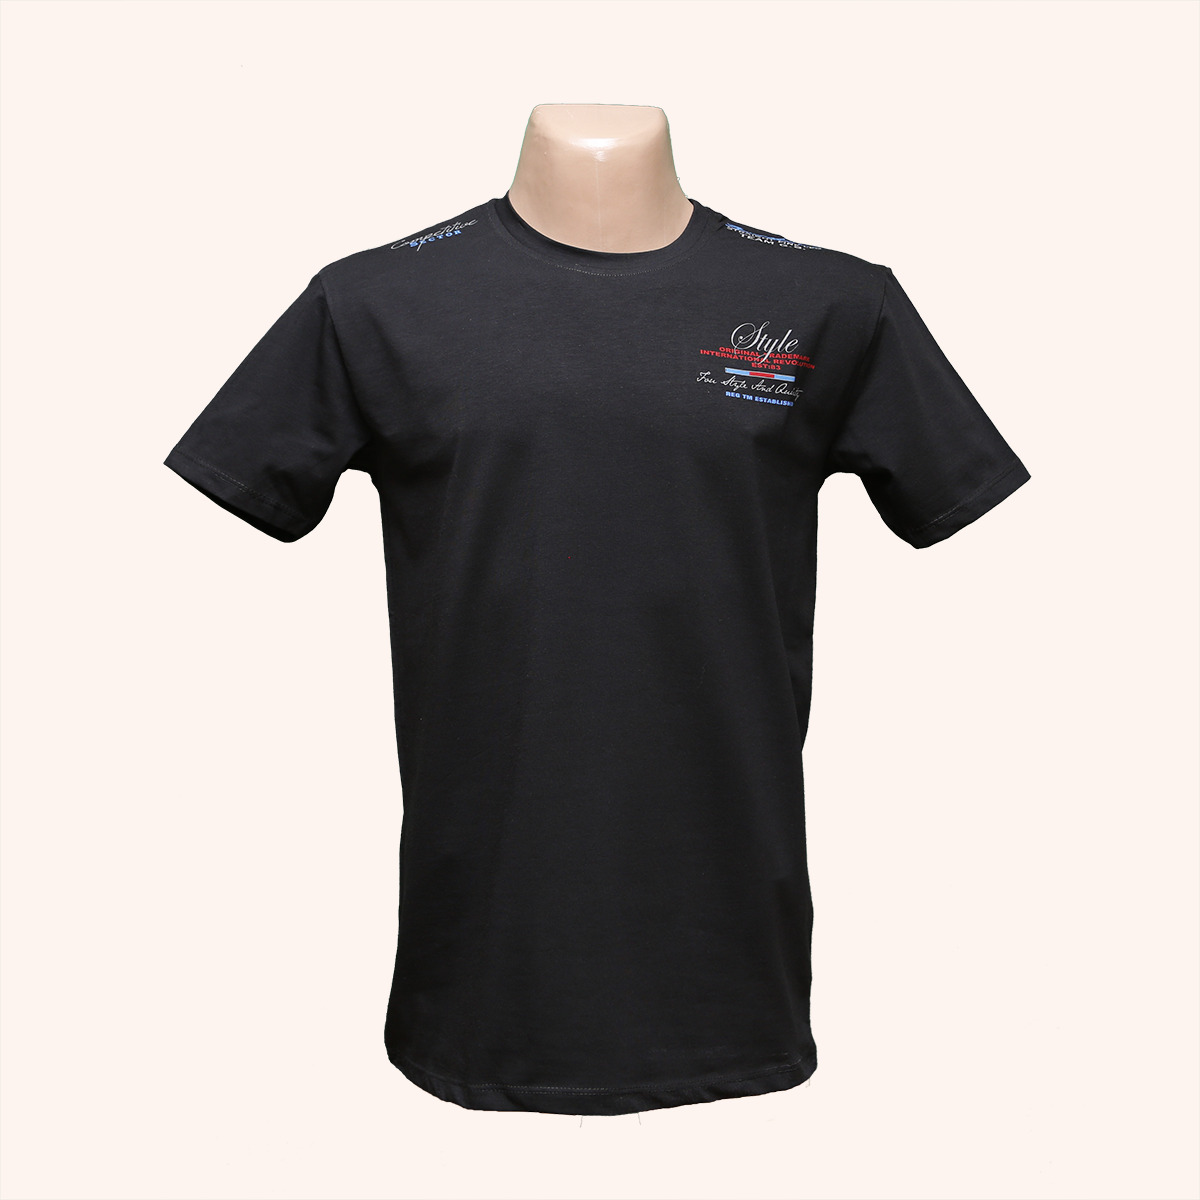 Мужская стрейчевая футболка Lycra тм. BY Walker. пр-во Турция 4046-6